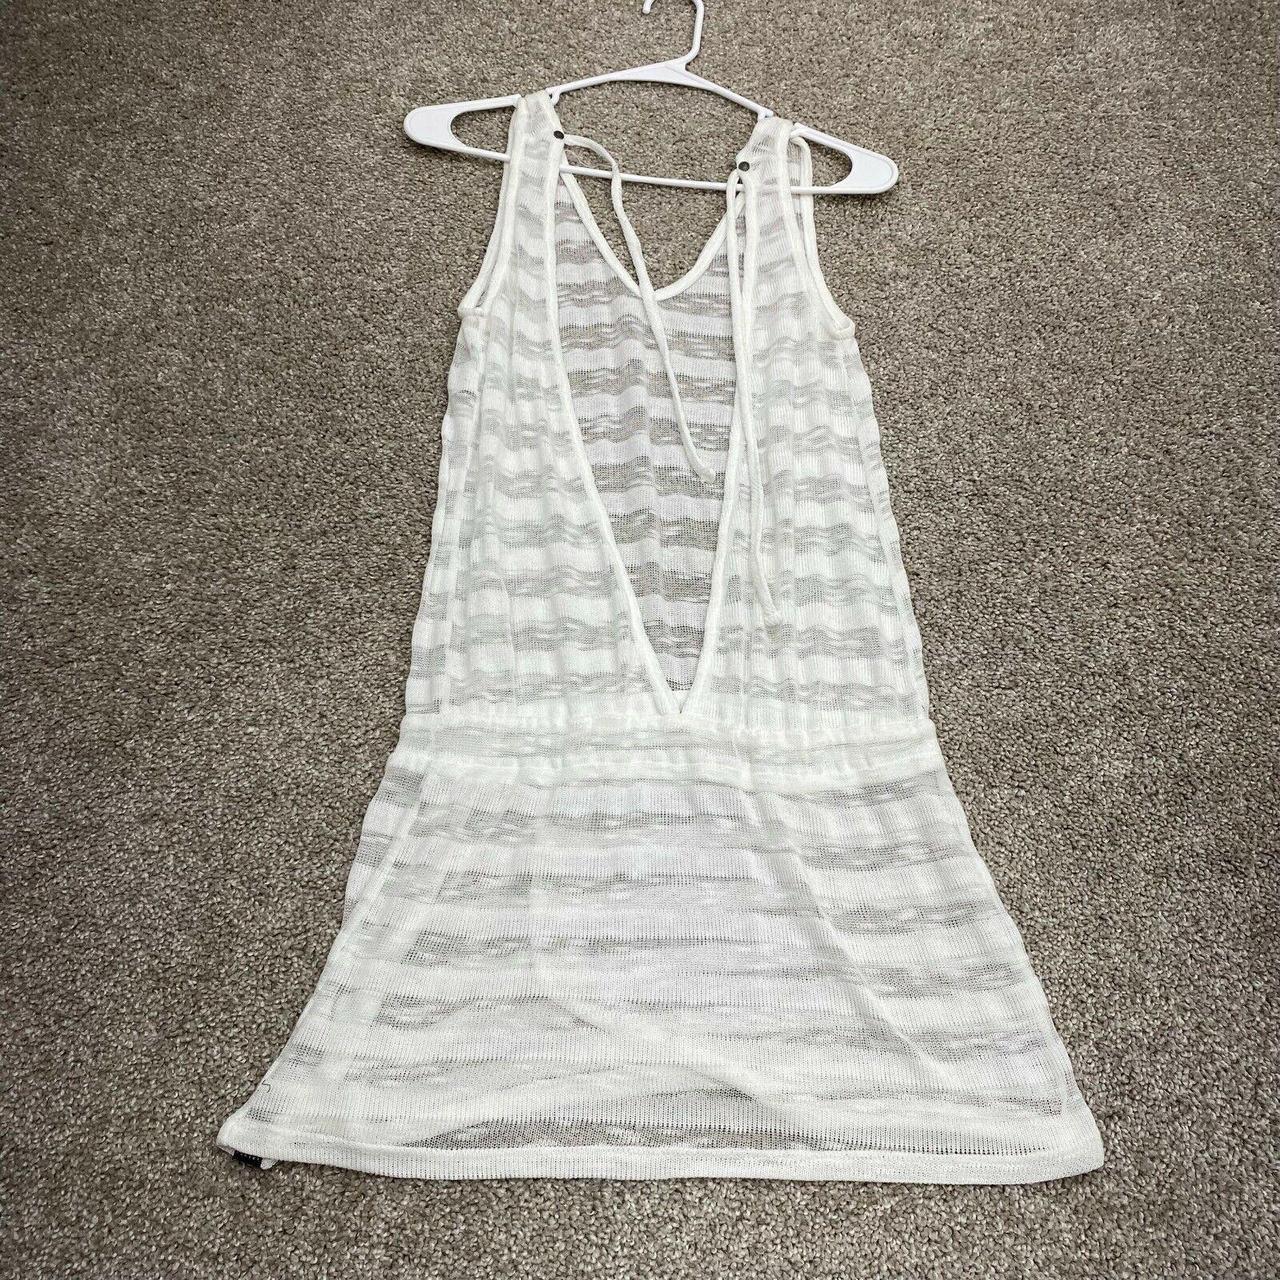 Product Image 1 - Oakley Womens Shirt Small White